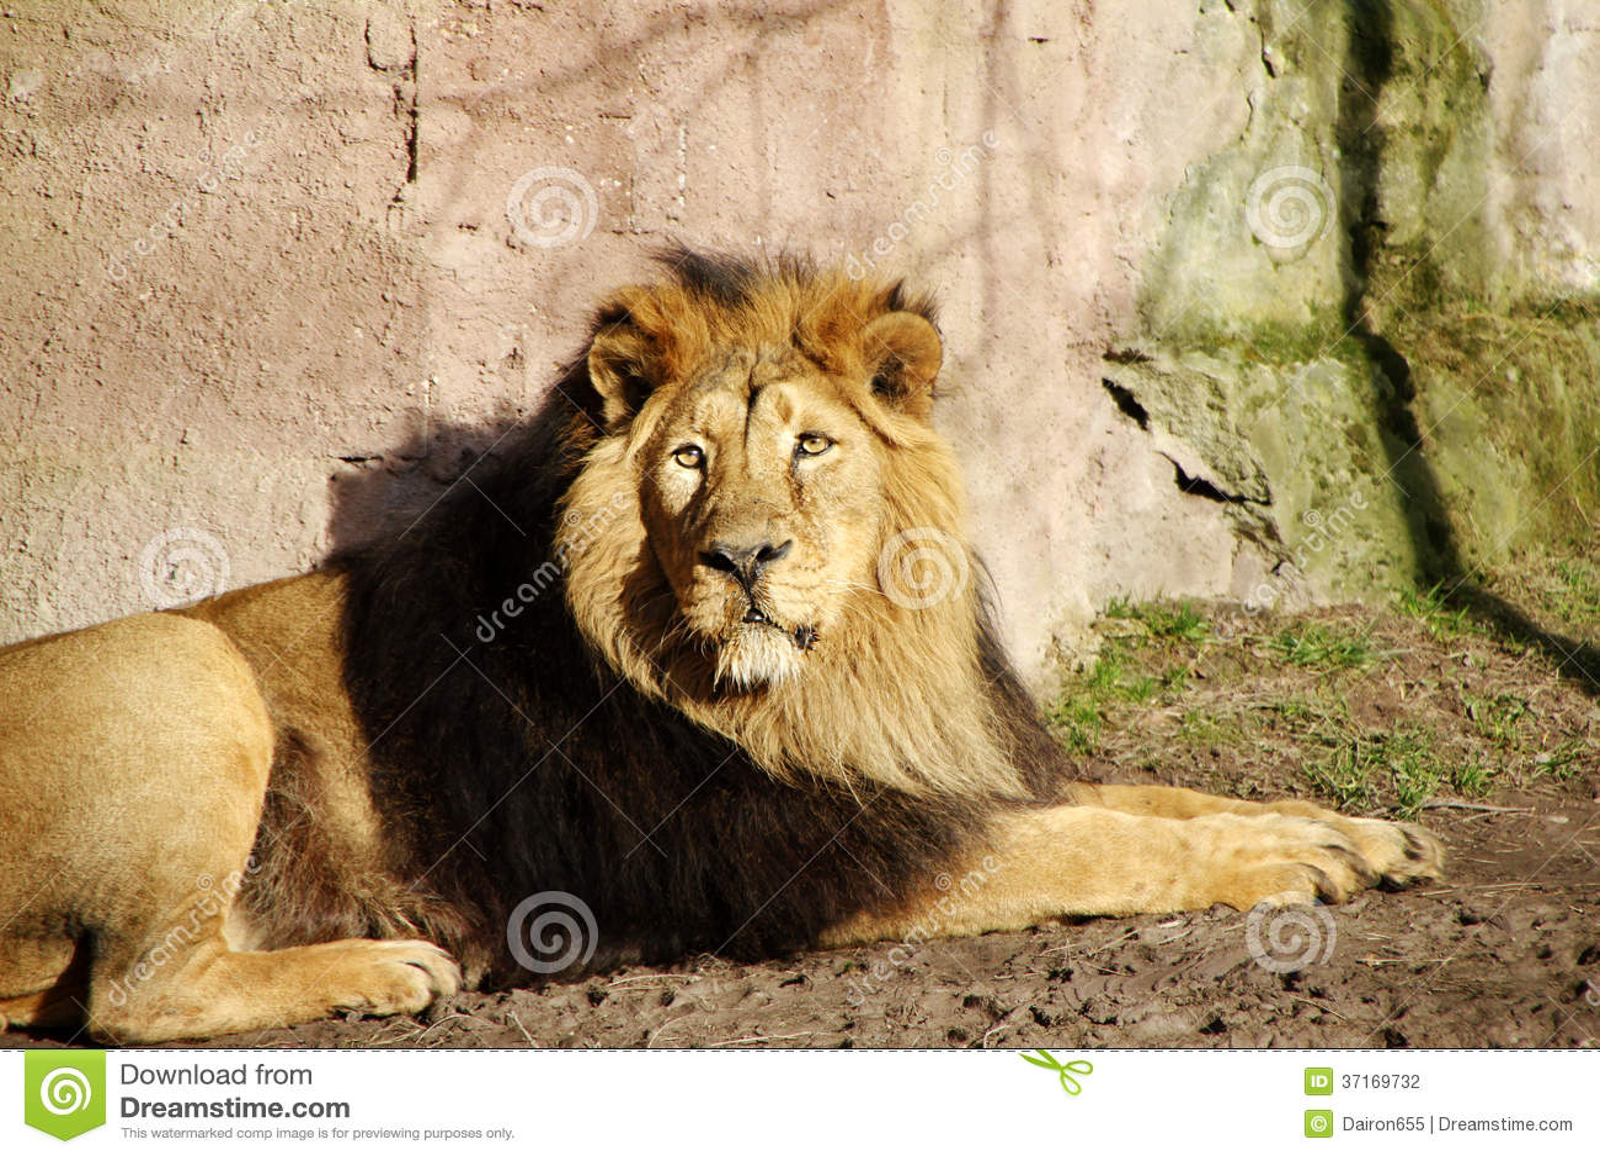 Lion Stock Photography - Image: 37169732